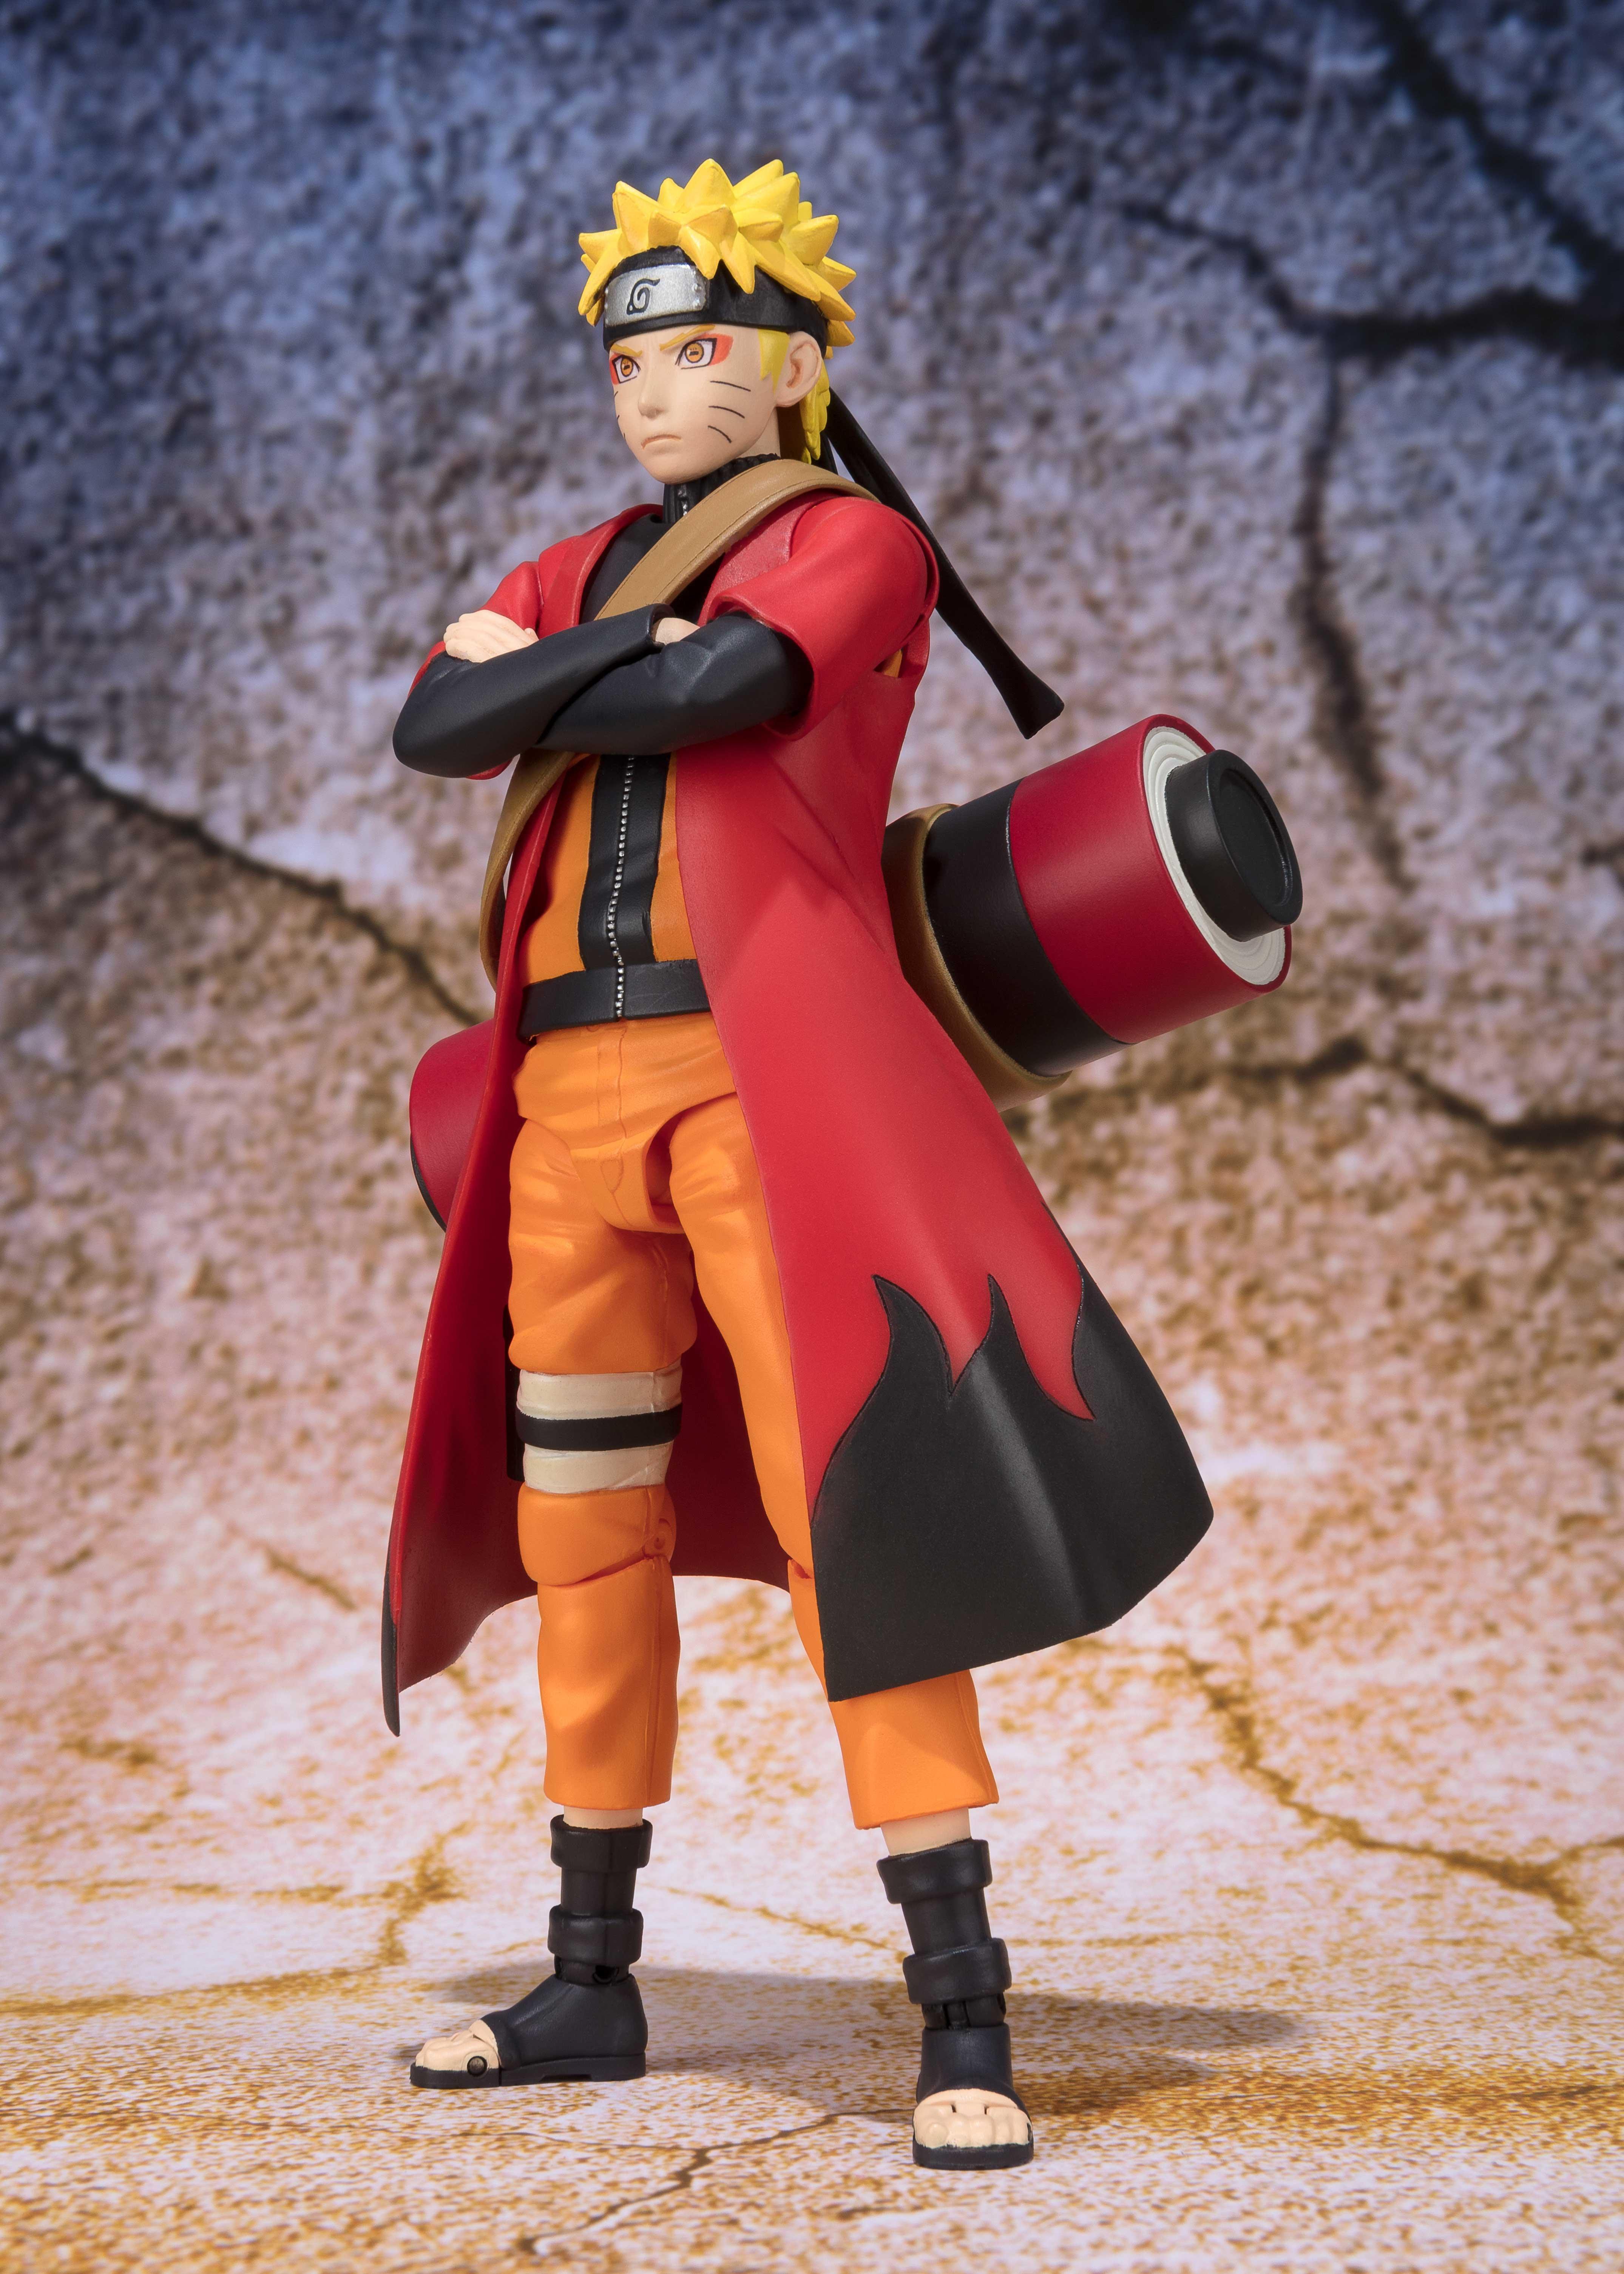 Best Selection Naruto Shippuden Naruto Uzumaki PRE-ORDER Bandai S.H.Figuarts